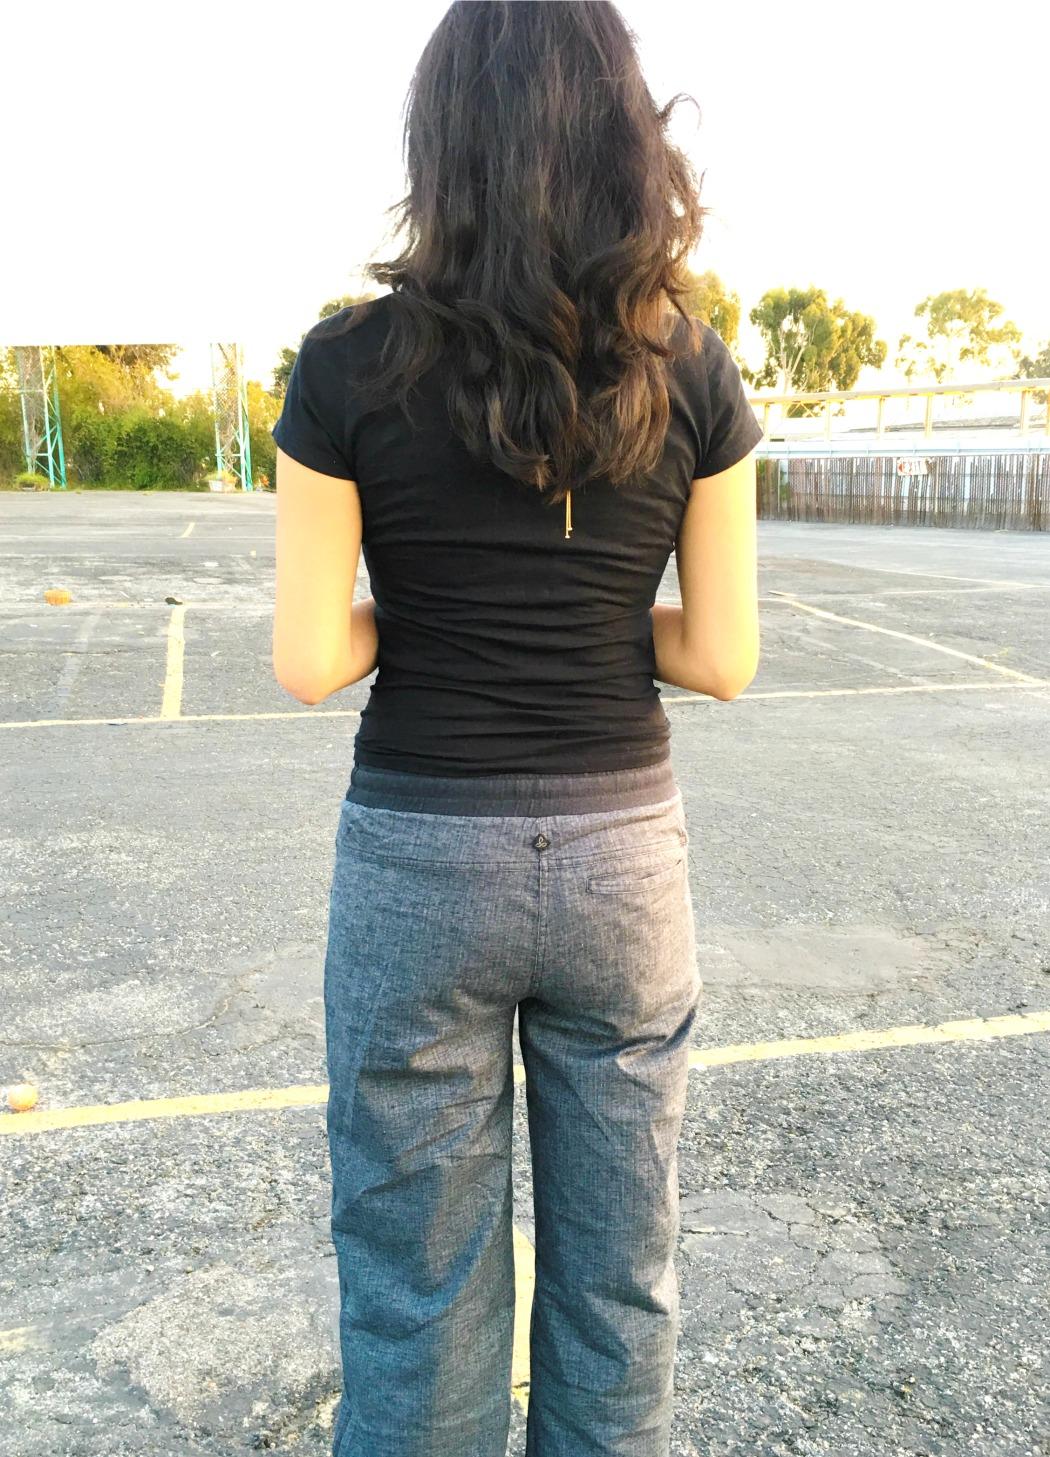 prAna pants weekend outfit - LivingMiVidaloca.com